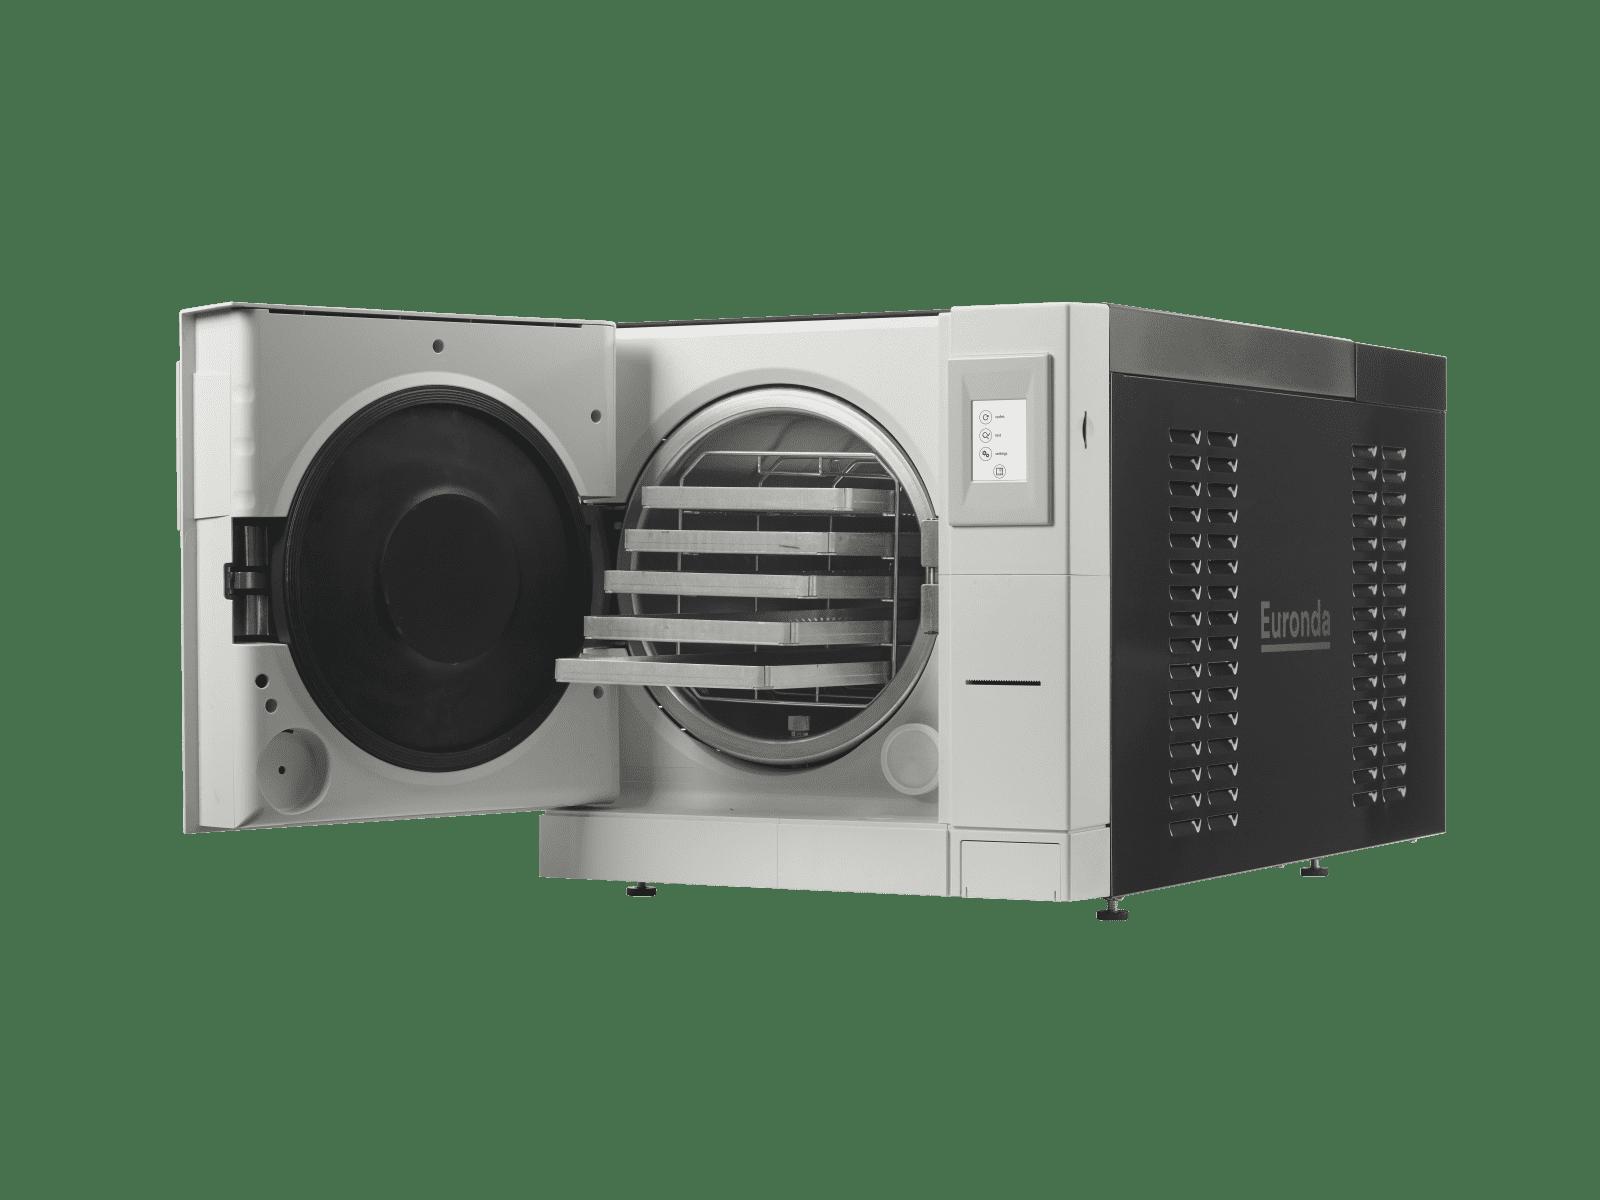 Euronda Autoklav Sterilisator EXL 29 Liter Kammer